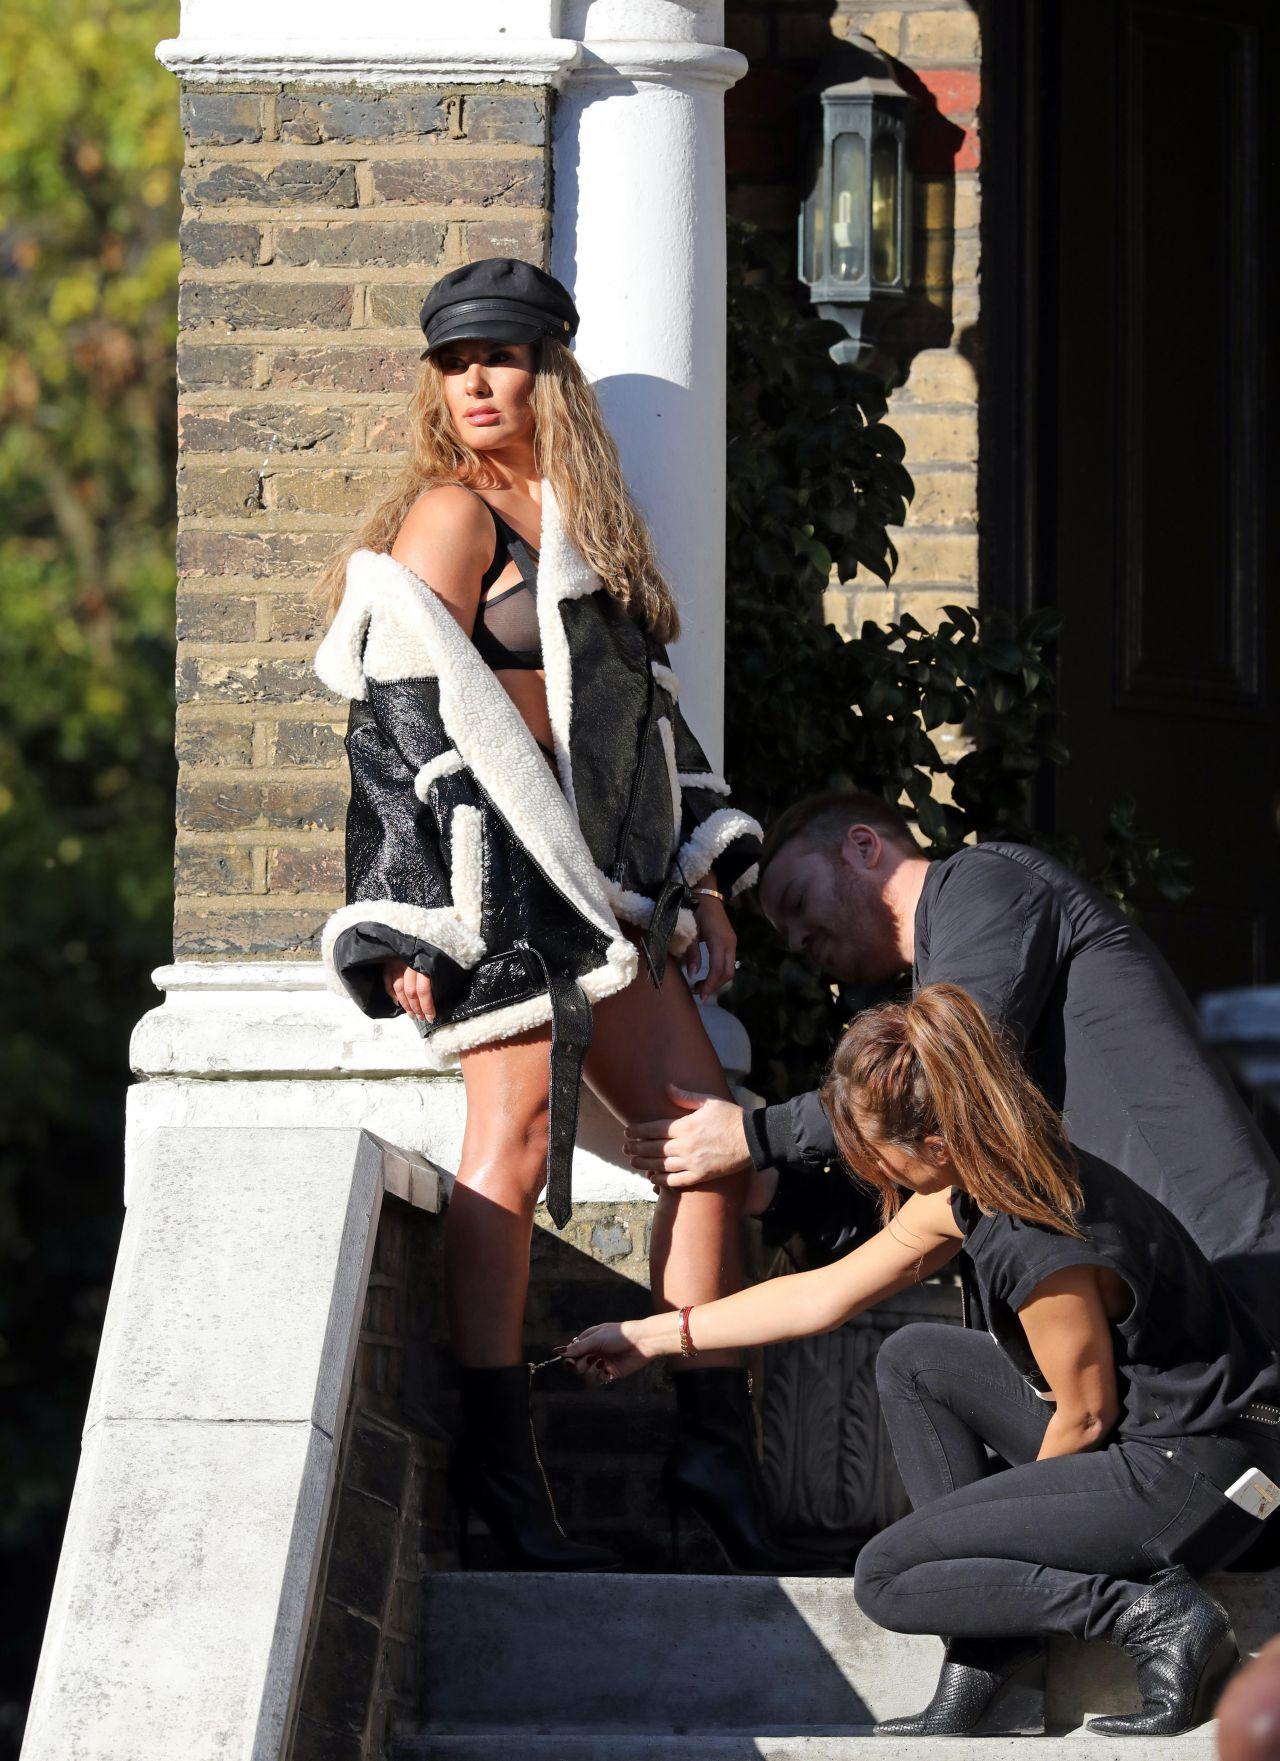 rebekah vardy photoshoot london 01022018